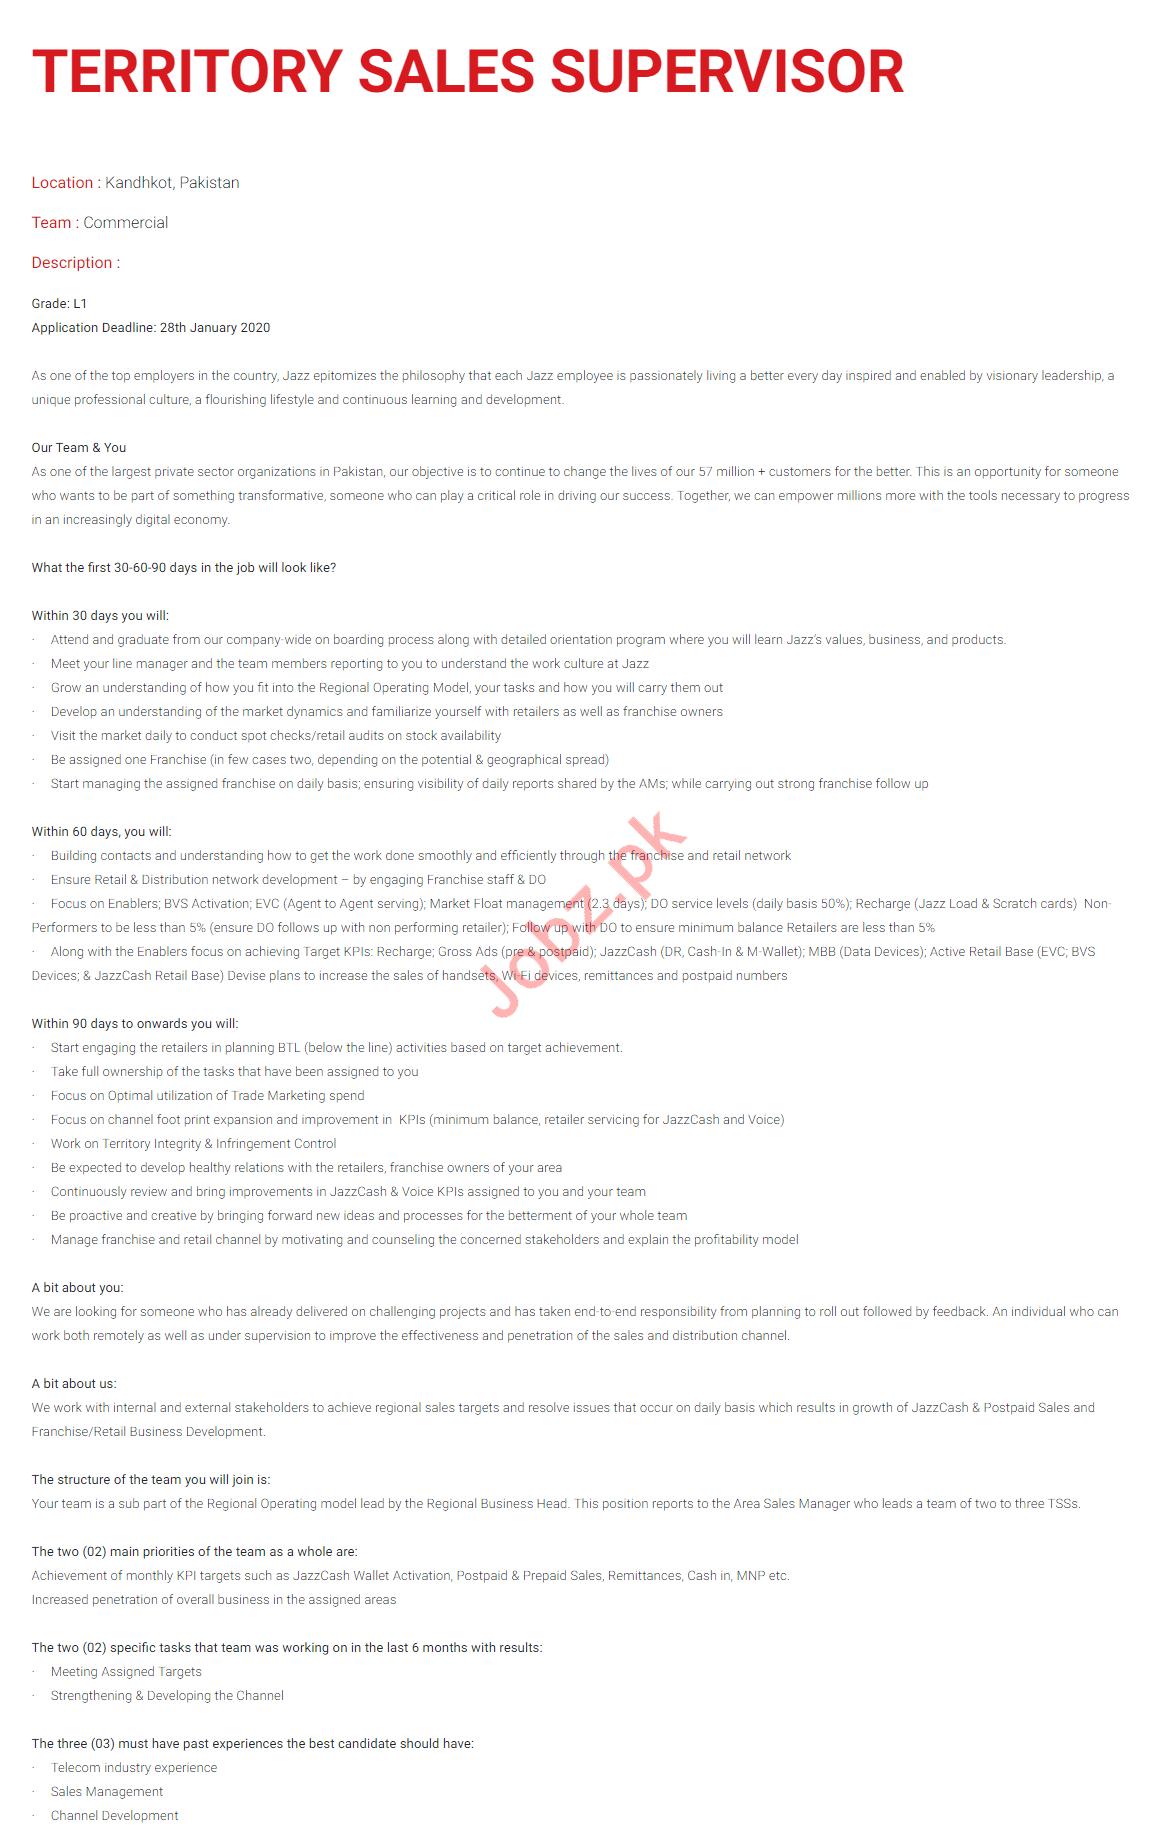 Territory Sales Supervisor Jobs in Jaz Telecom